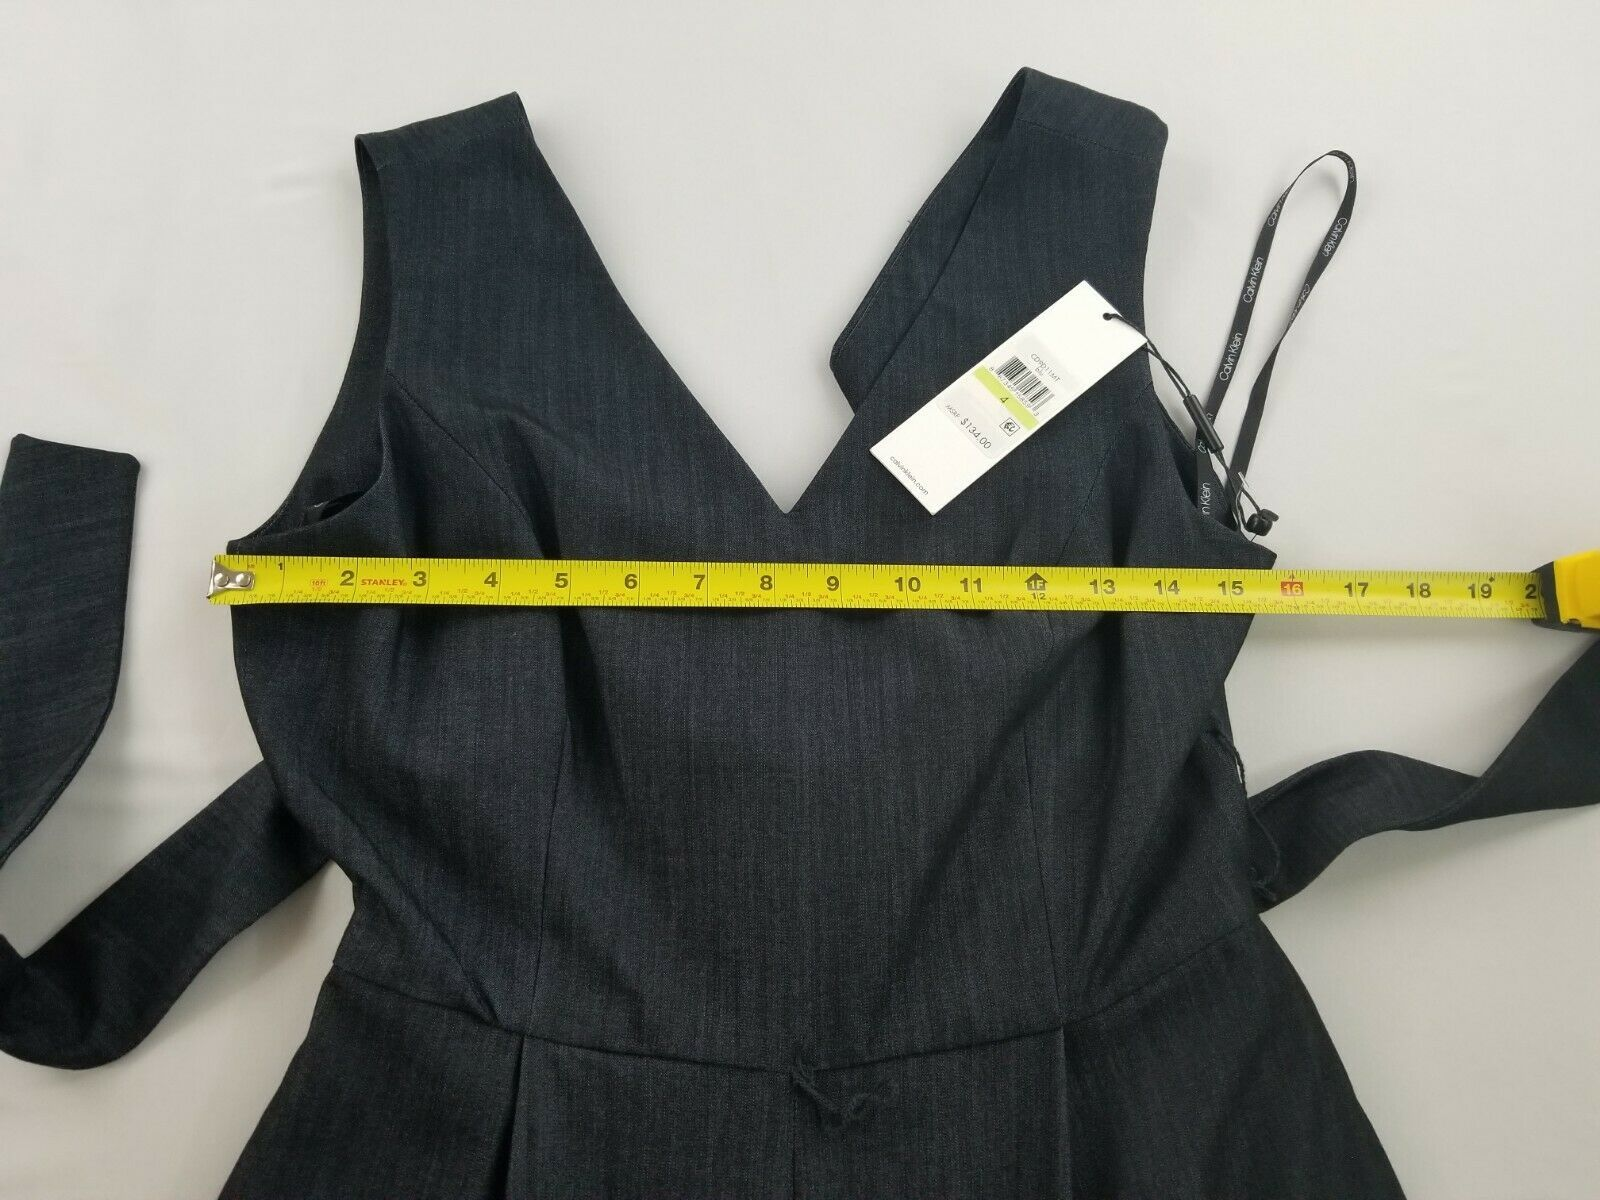 Nuevo Calvin Klein Mujer Mono Mono Pantalones Top CD9D11MT Azul Marino 4 Msrp image 6